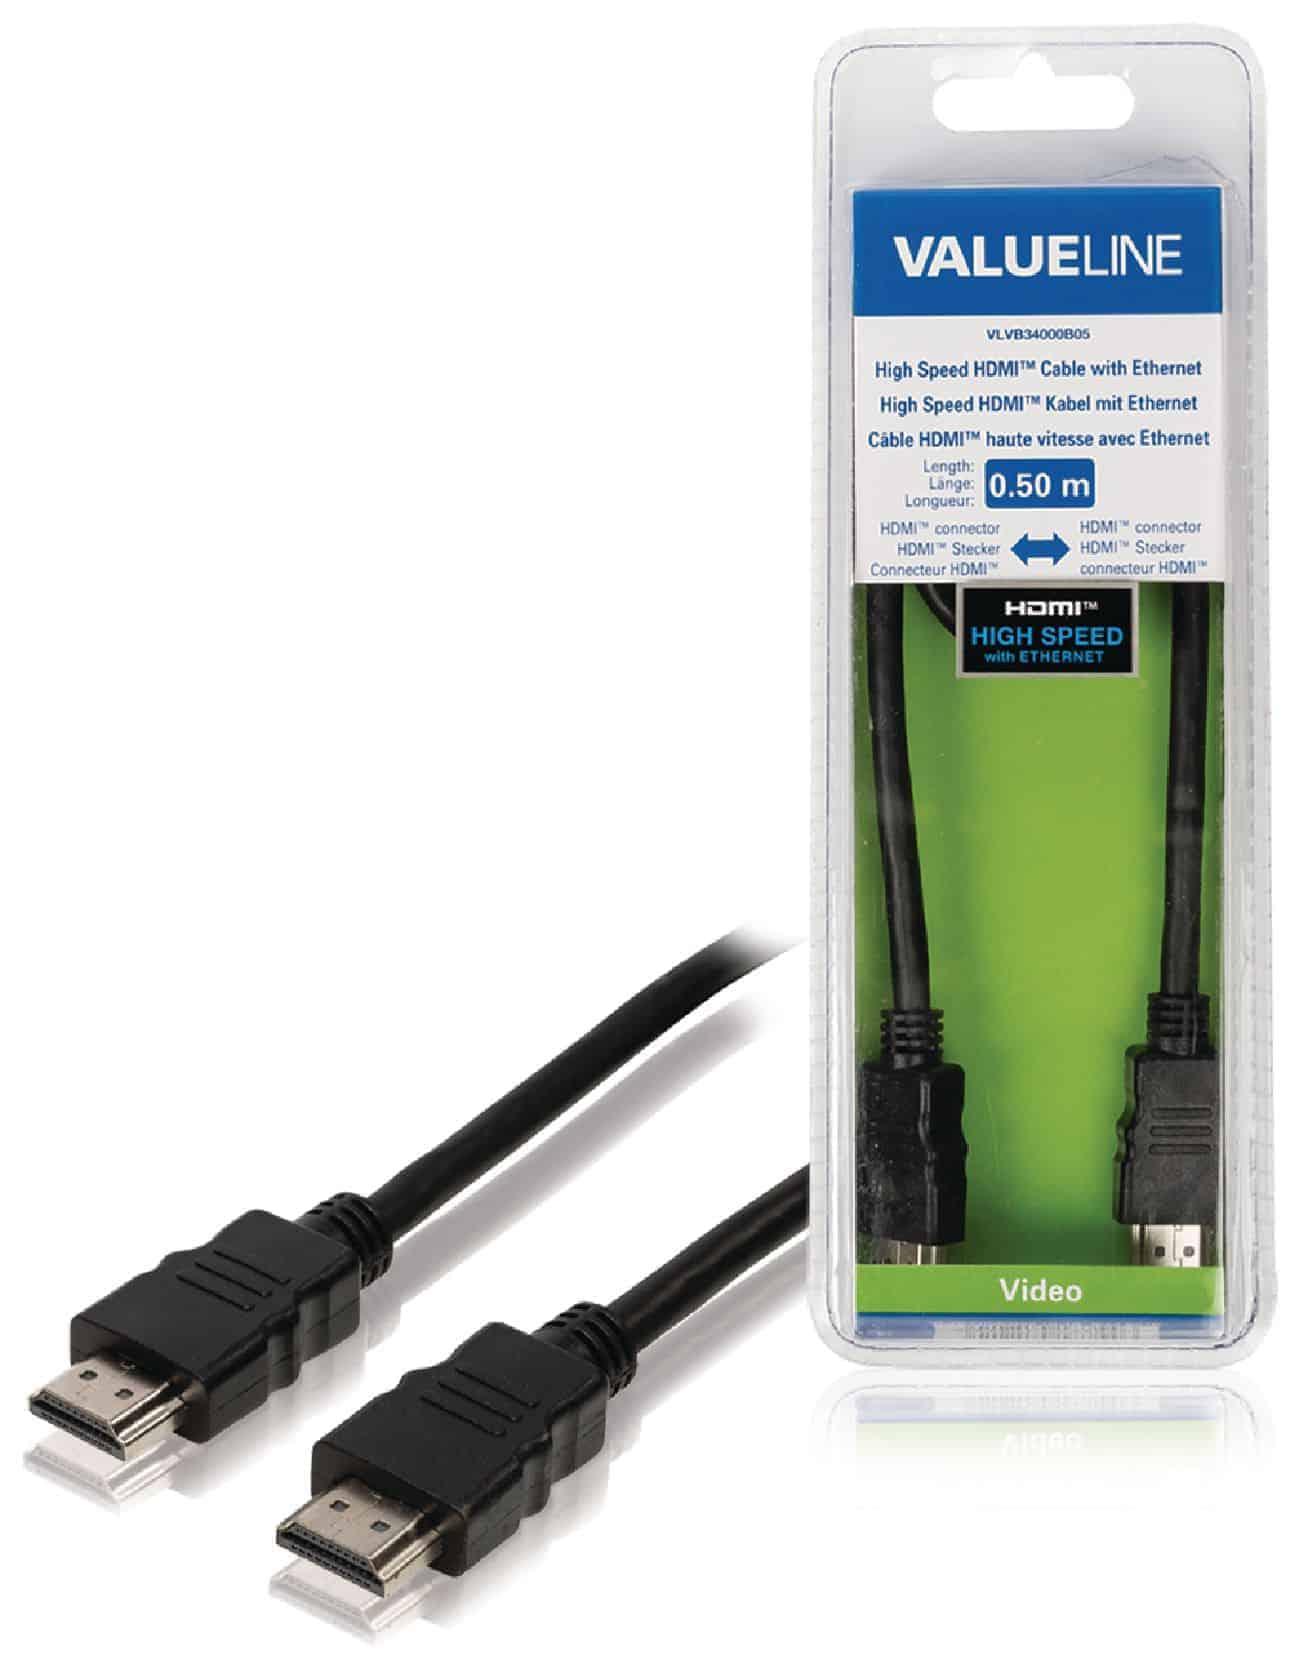 VALUELINE HDMI-KAAPELI HIGH SPEED WITH ETHERNET 0